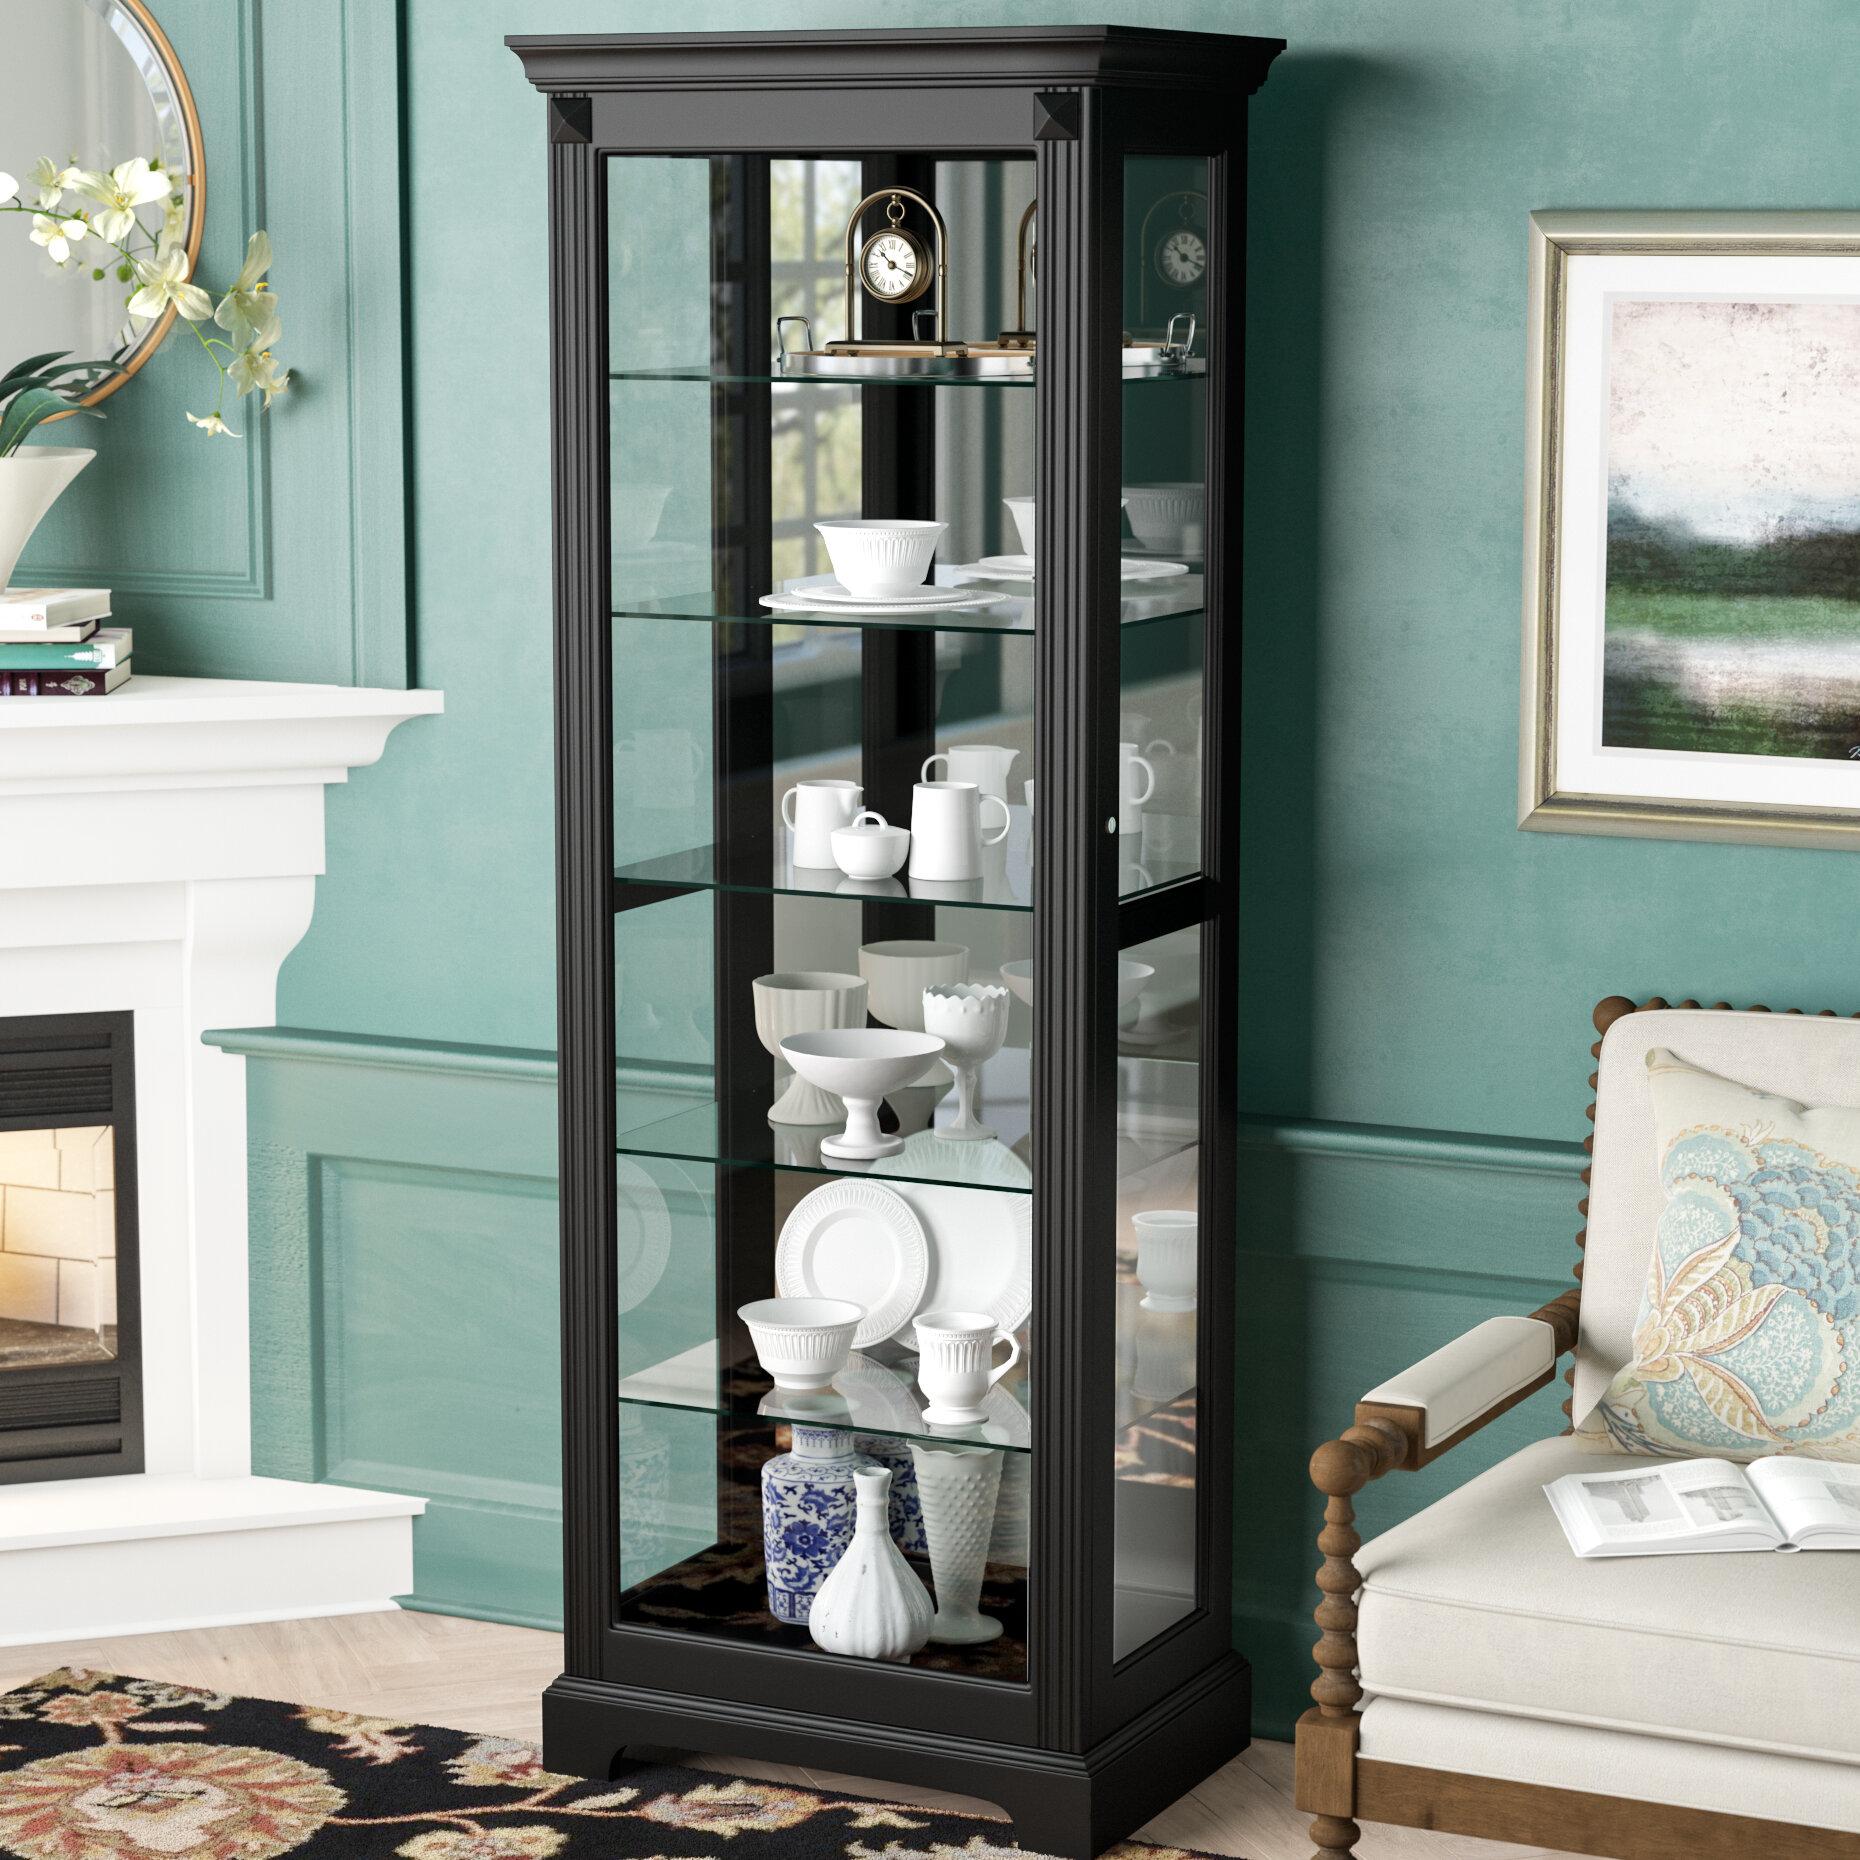 Darby Home Co Napier Lighted Curio Cabinet & Reviews | Wayfair